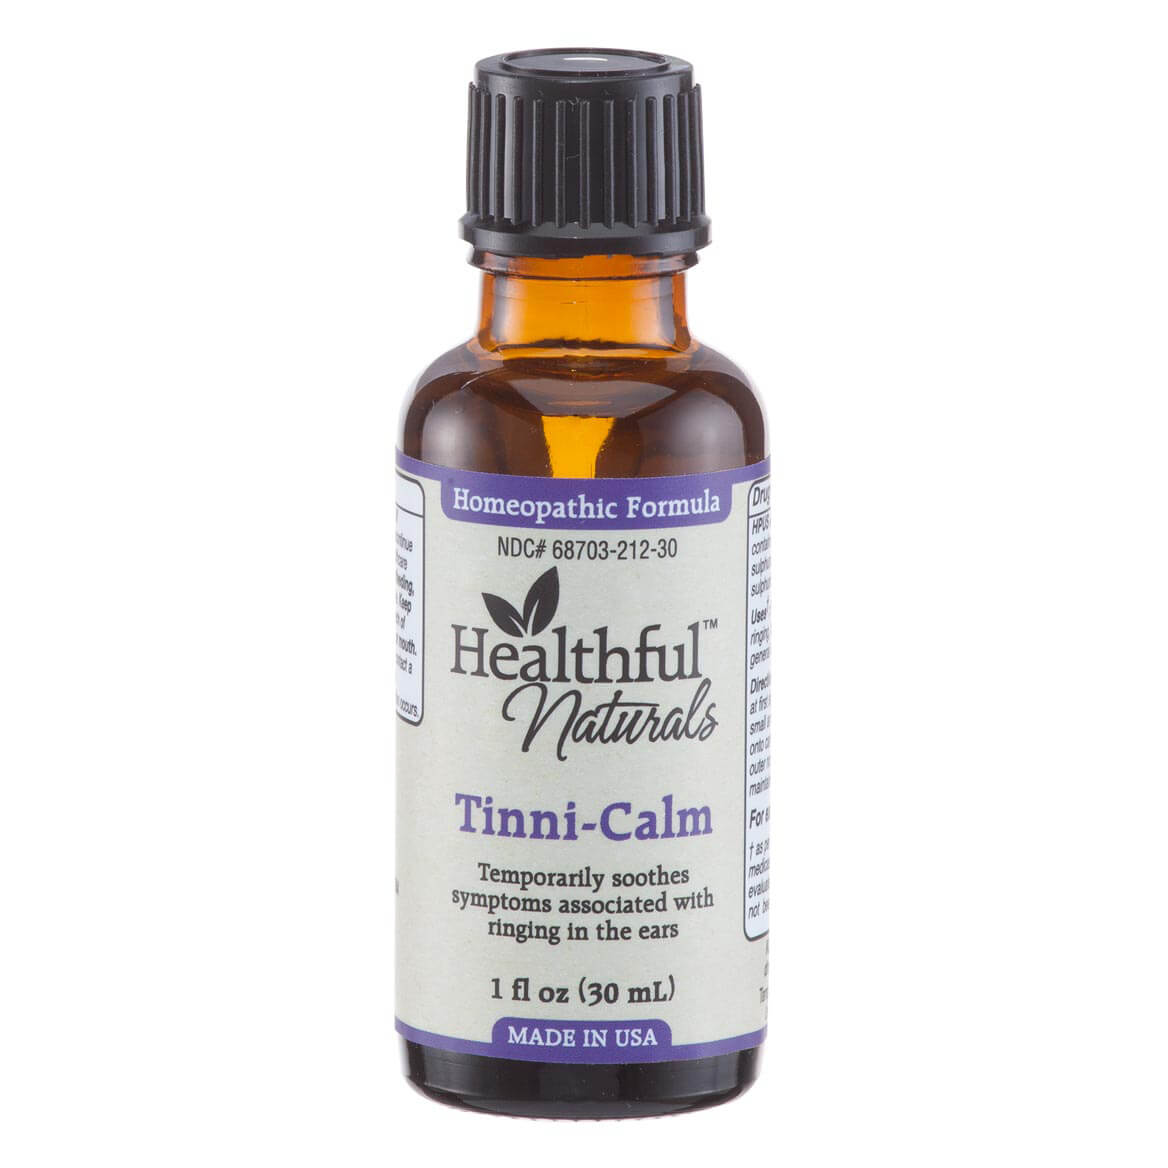 Healthful™ Naturals Tinni-Calm - 30ml-357960